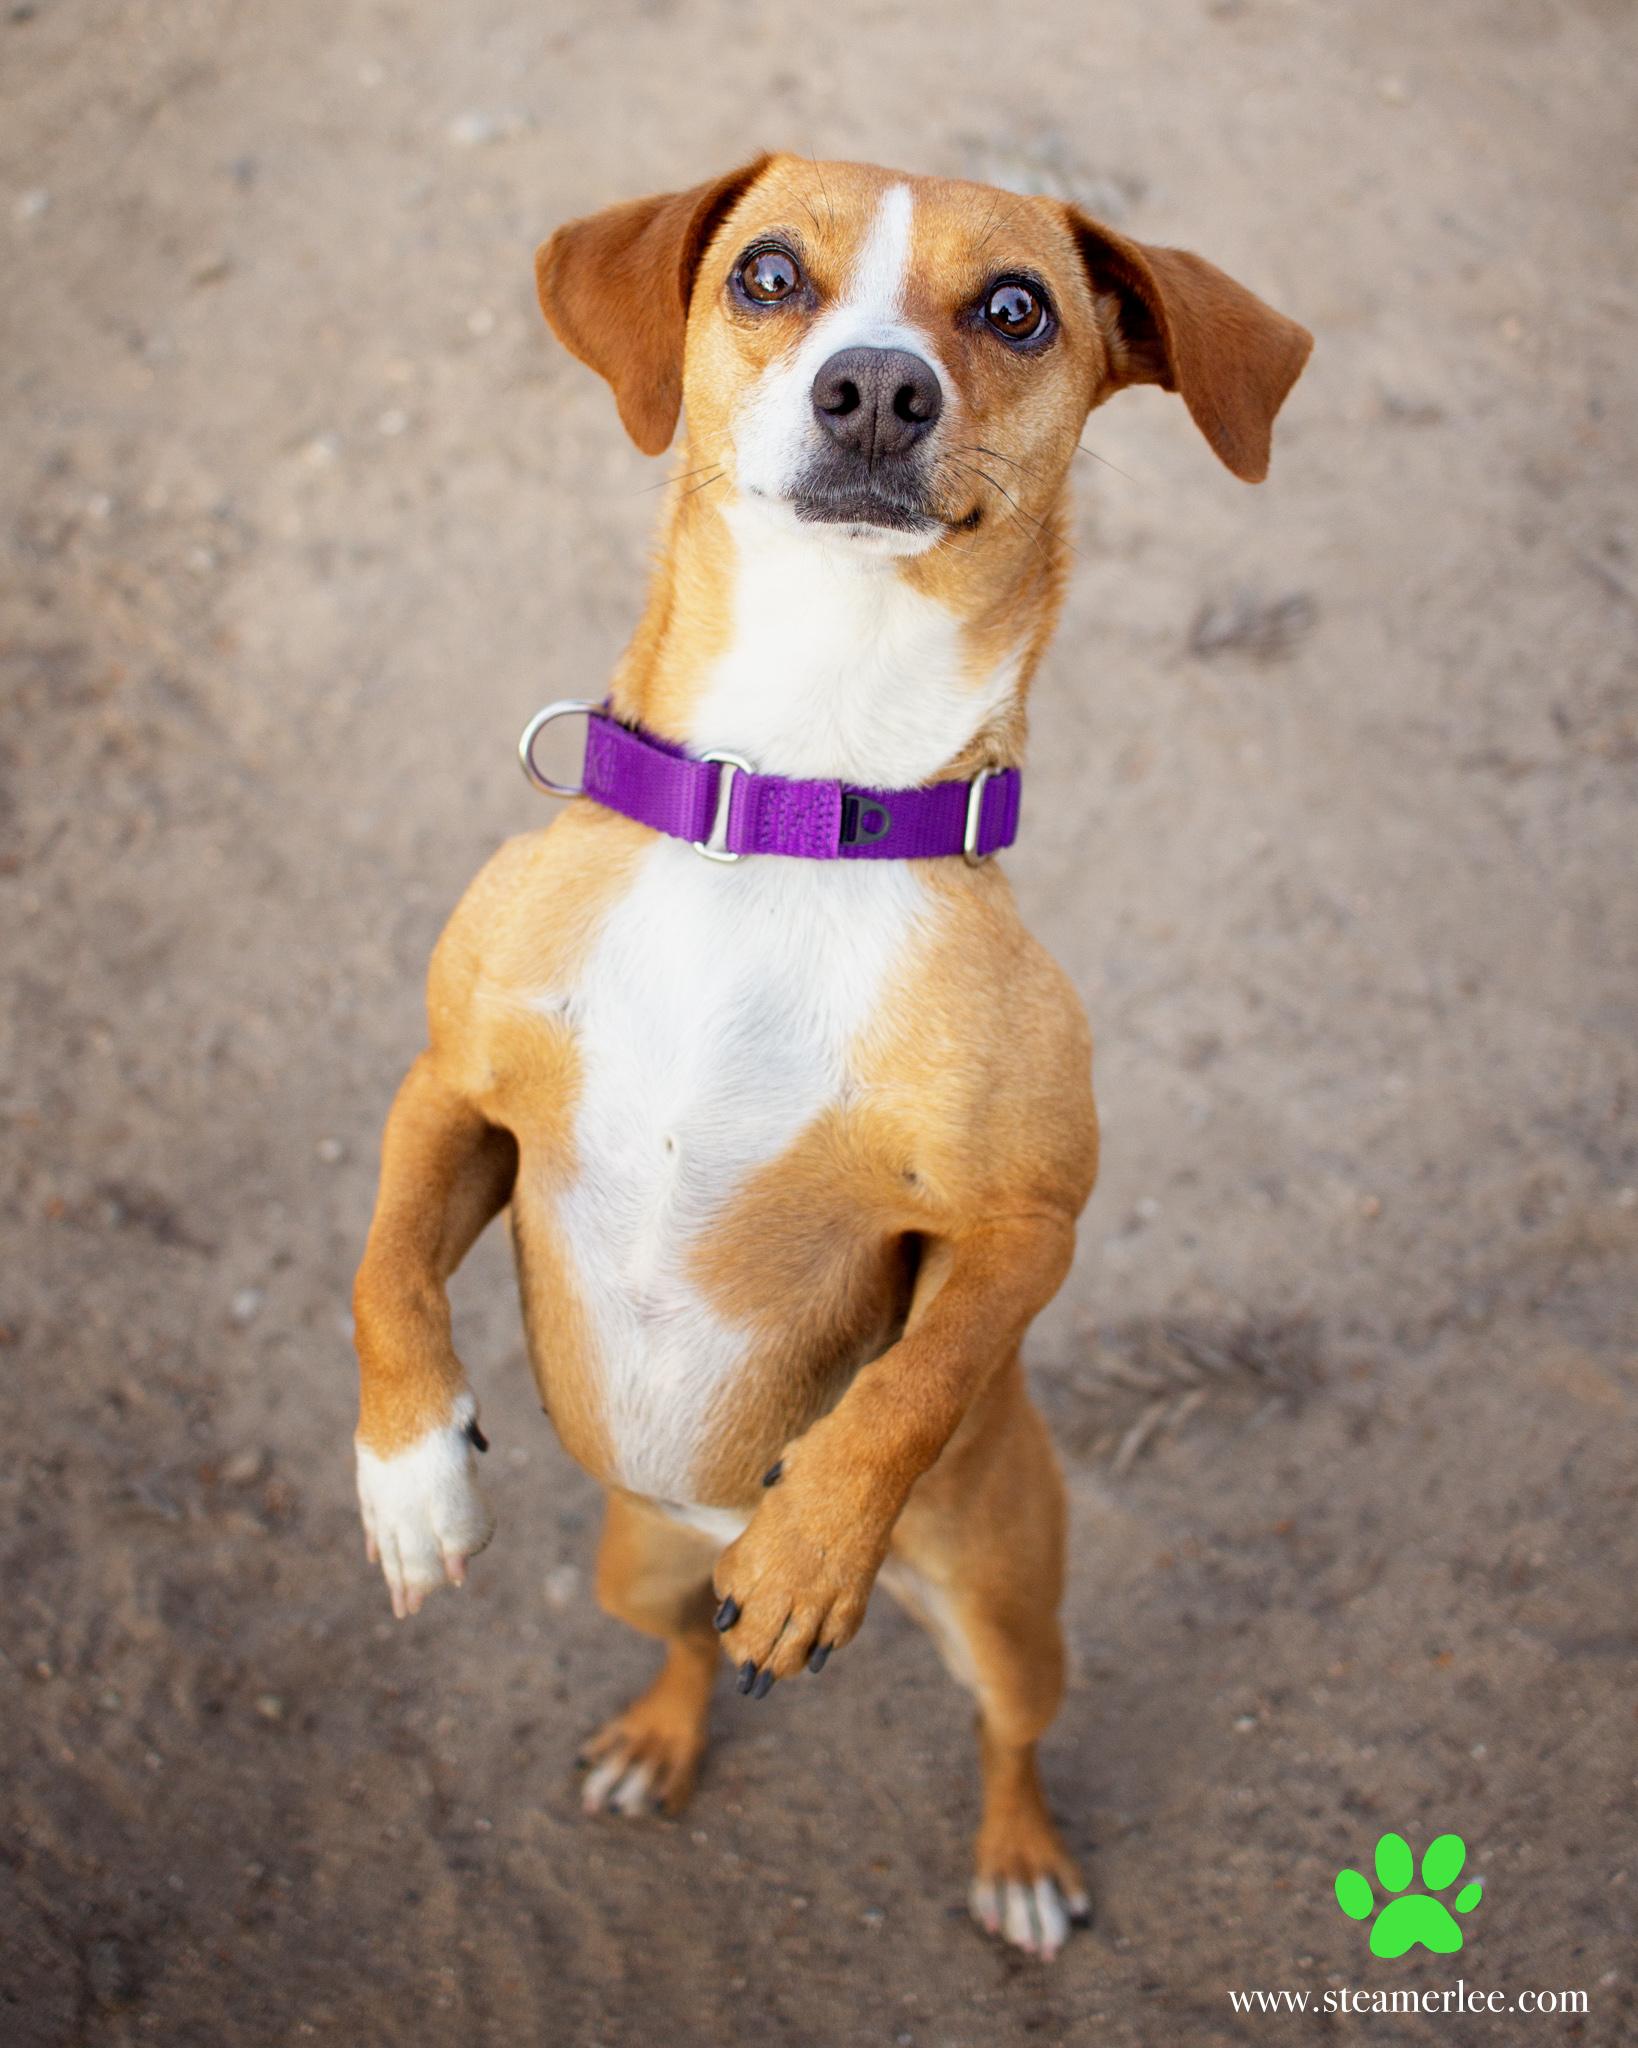 313-Orange-County-Dog-Photography-Steamer-Lee-Southern-California-SBACC.JPG